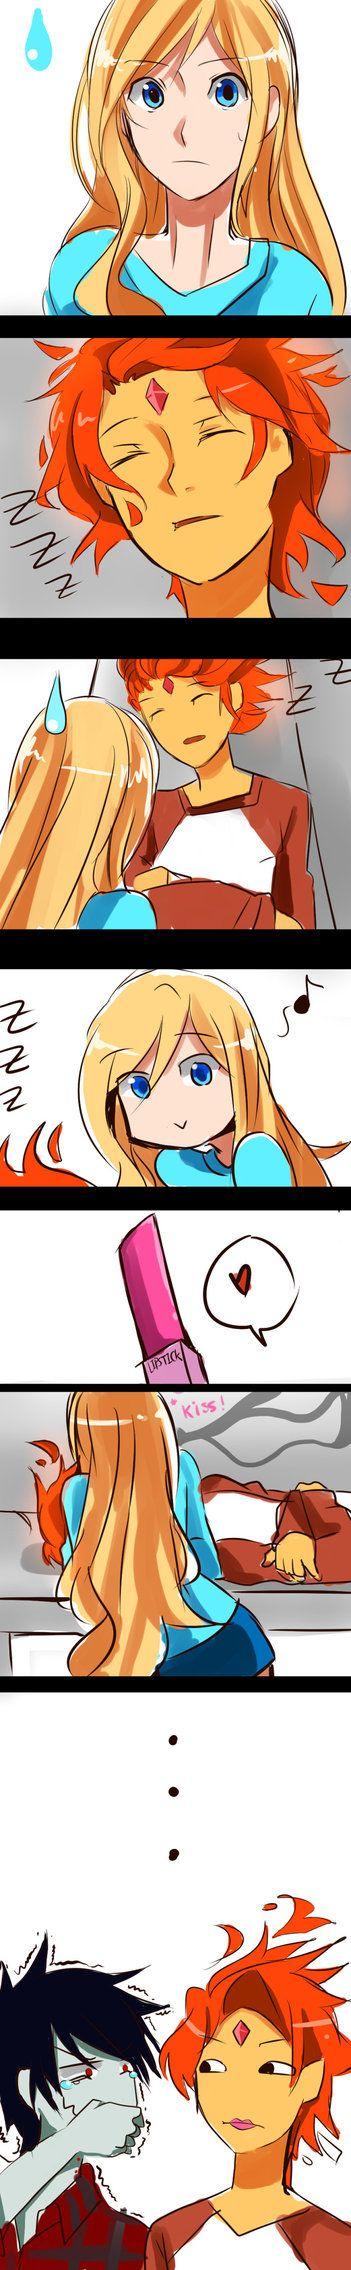 Flame Prince x Fionna : Lips (Strip Comic) by AnimeandCartoonFan on deviantART